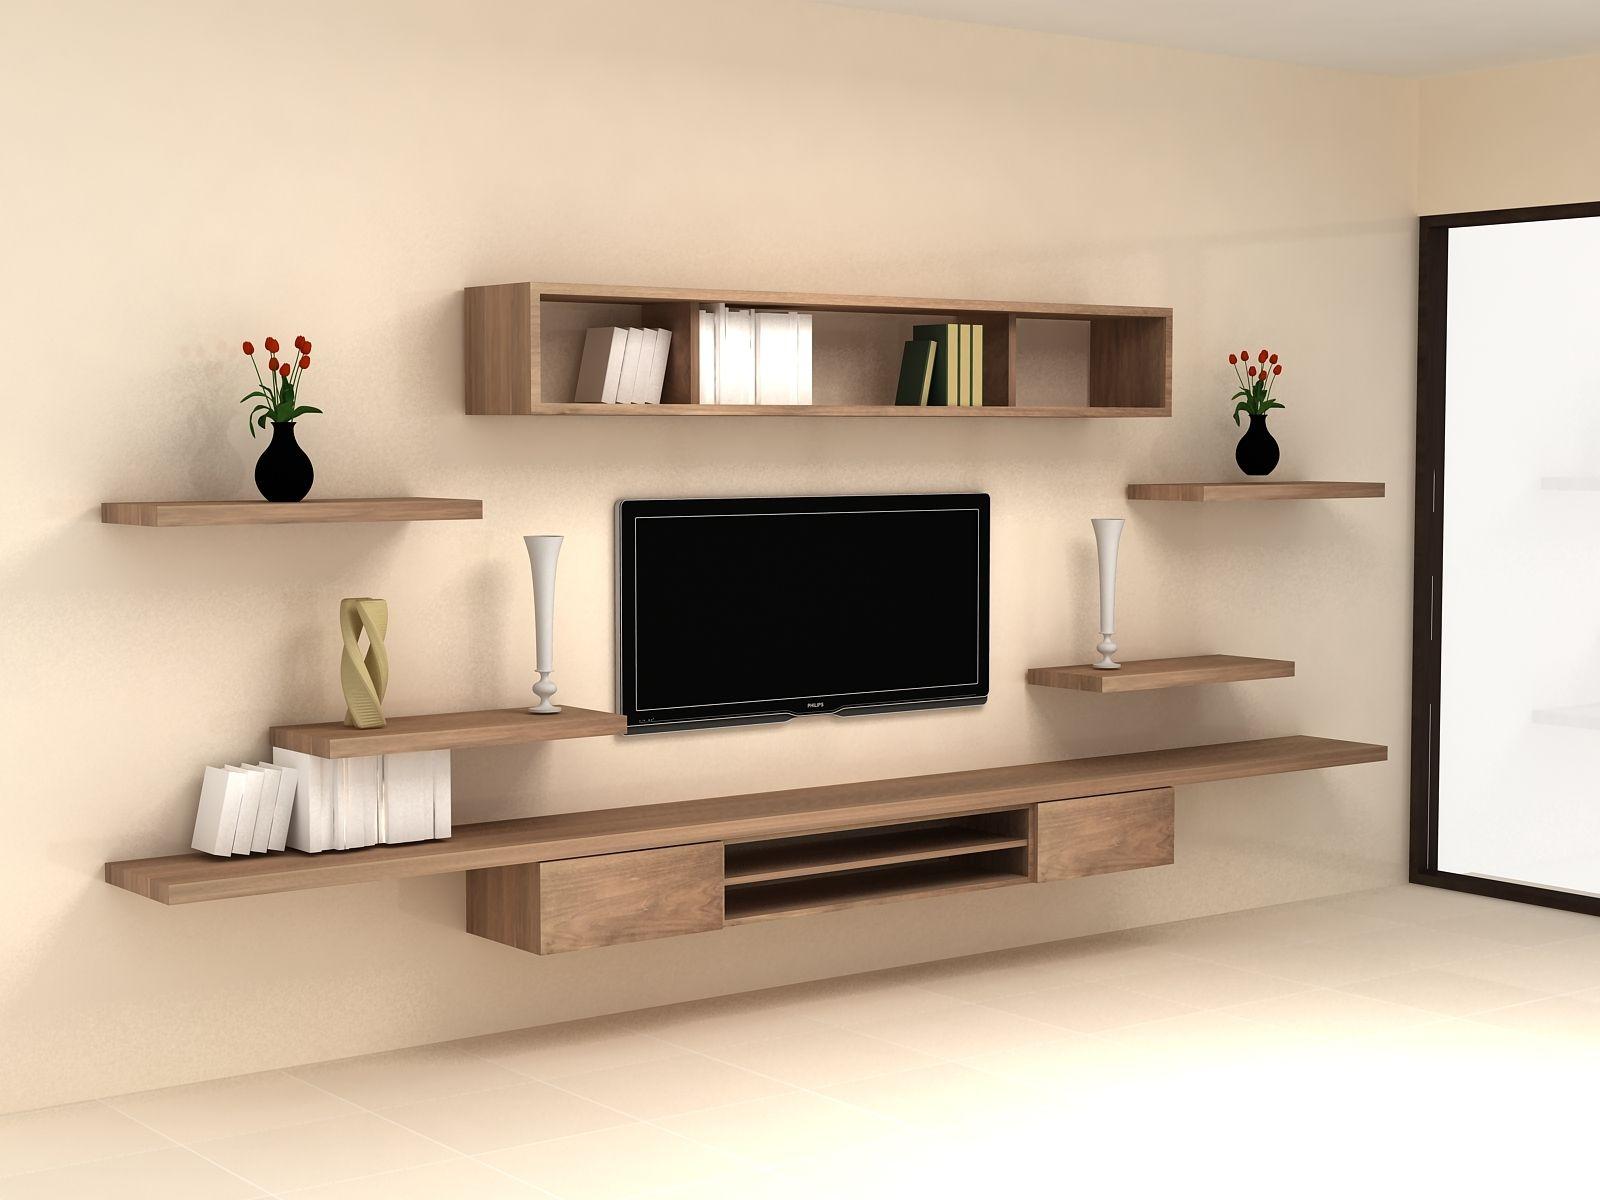 Wall Tv Cabinet Ideas  sss  Tv wall decor Tv unit